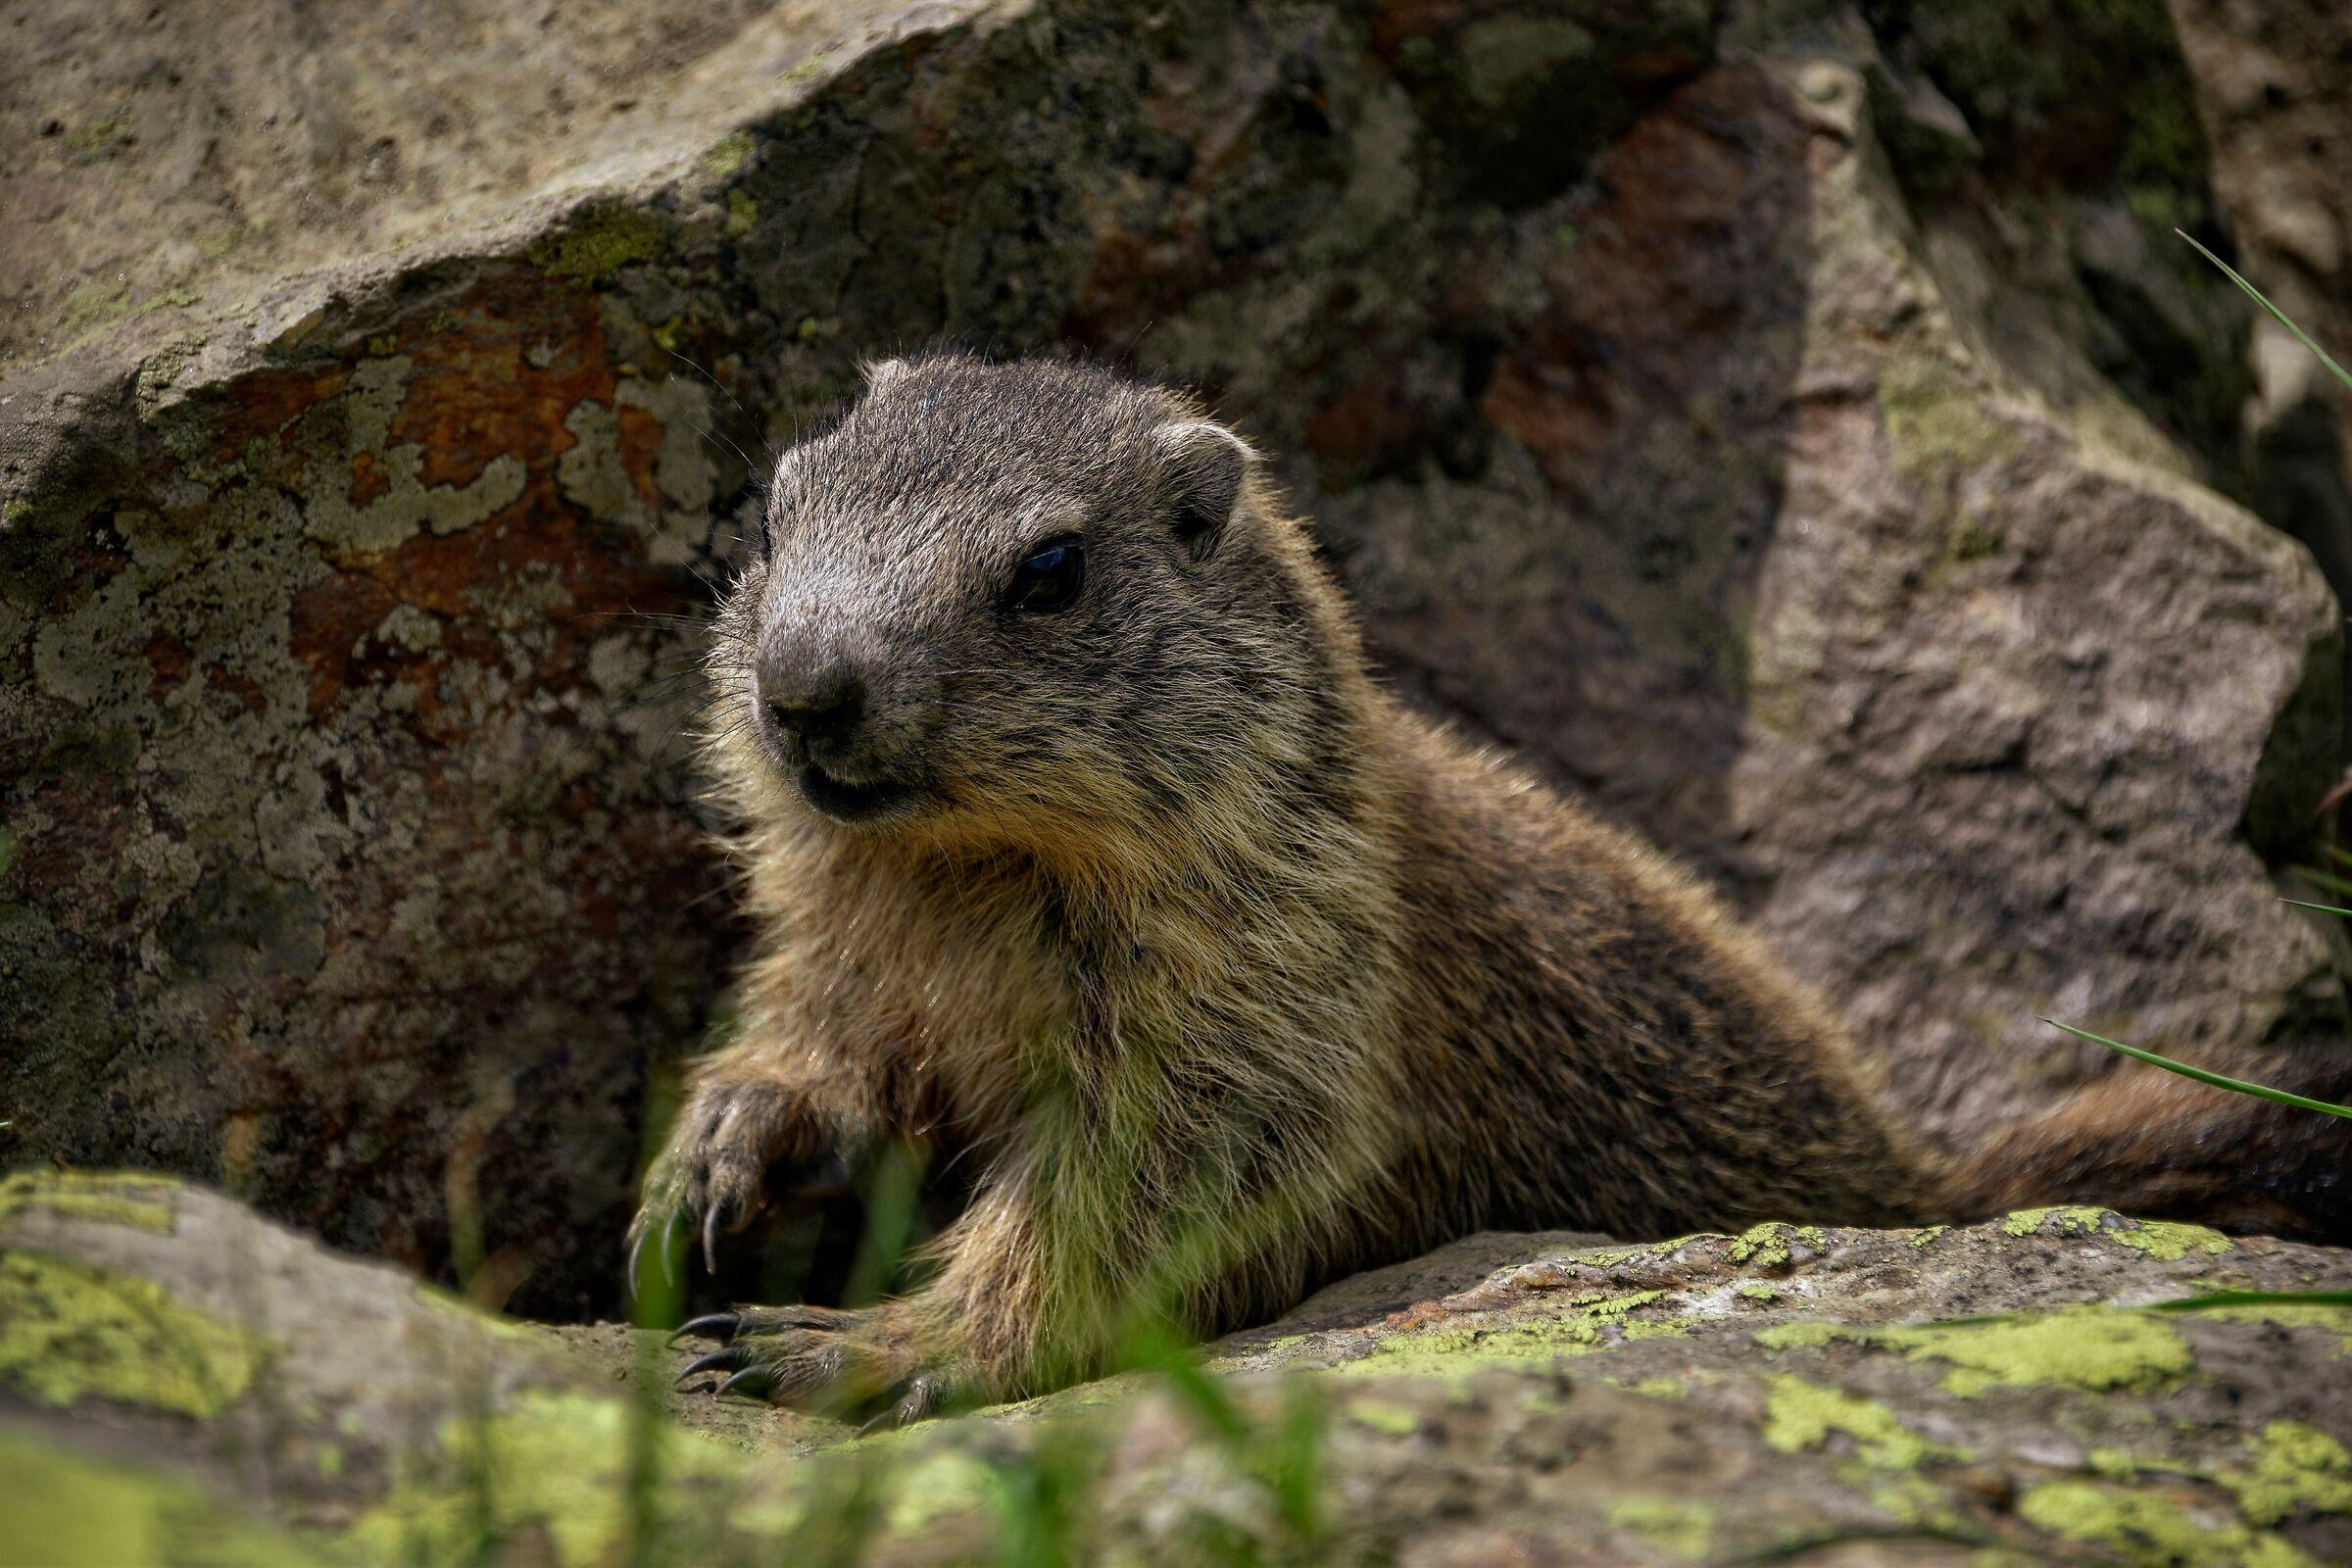 Una piccola marmotta...